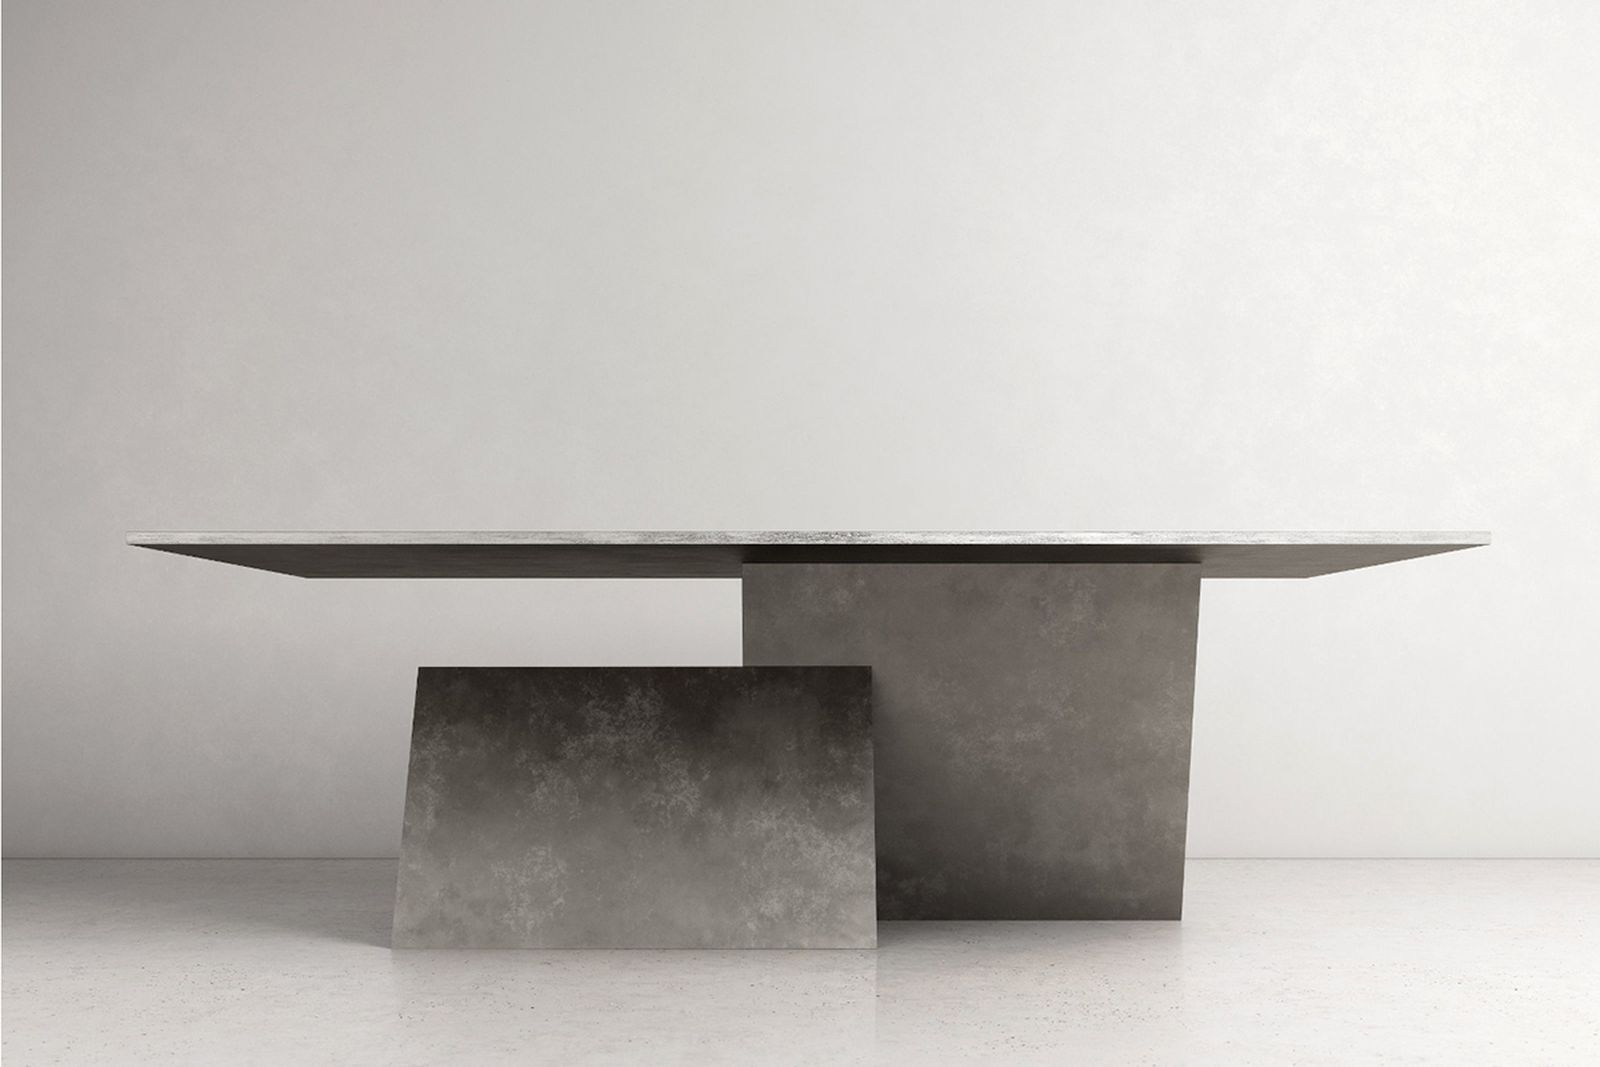 rick-owens-furniture-exhibit (2)